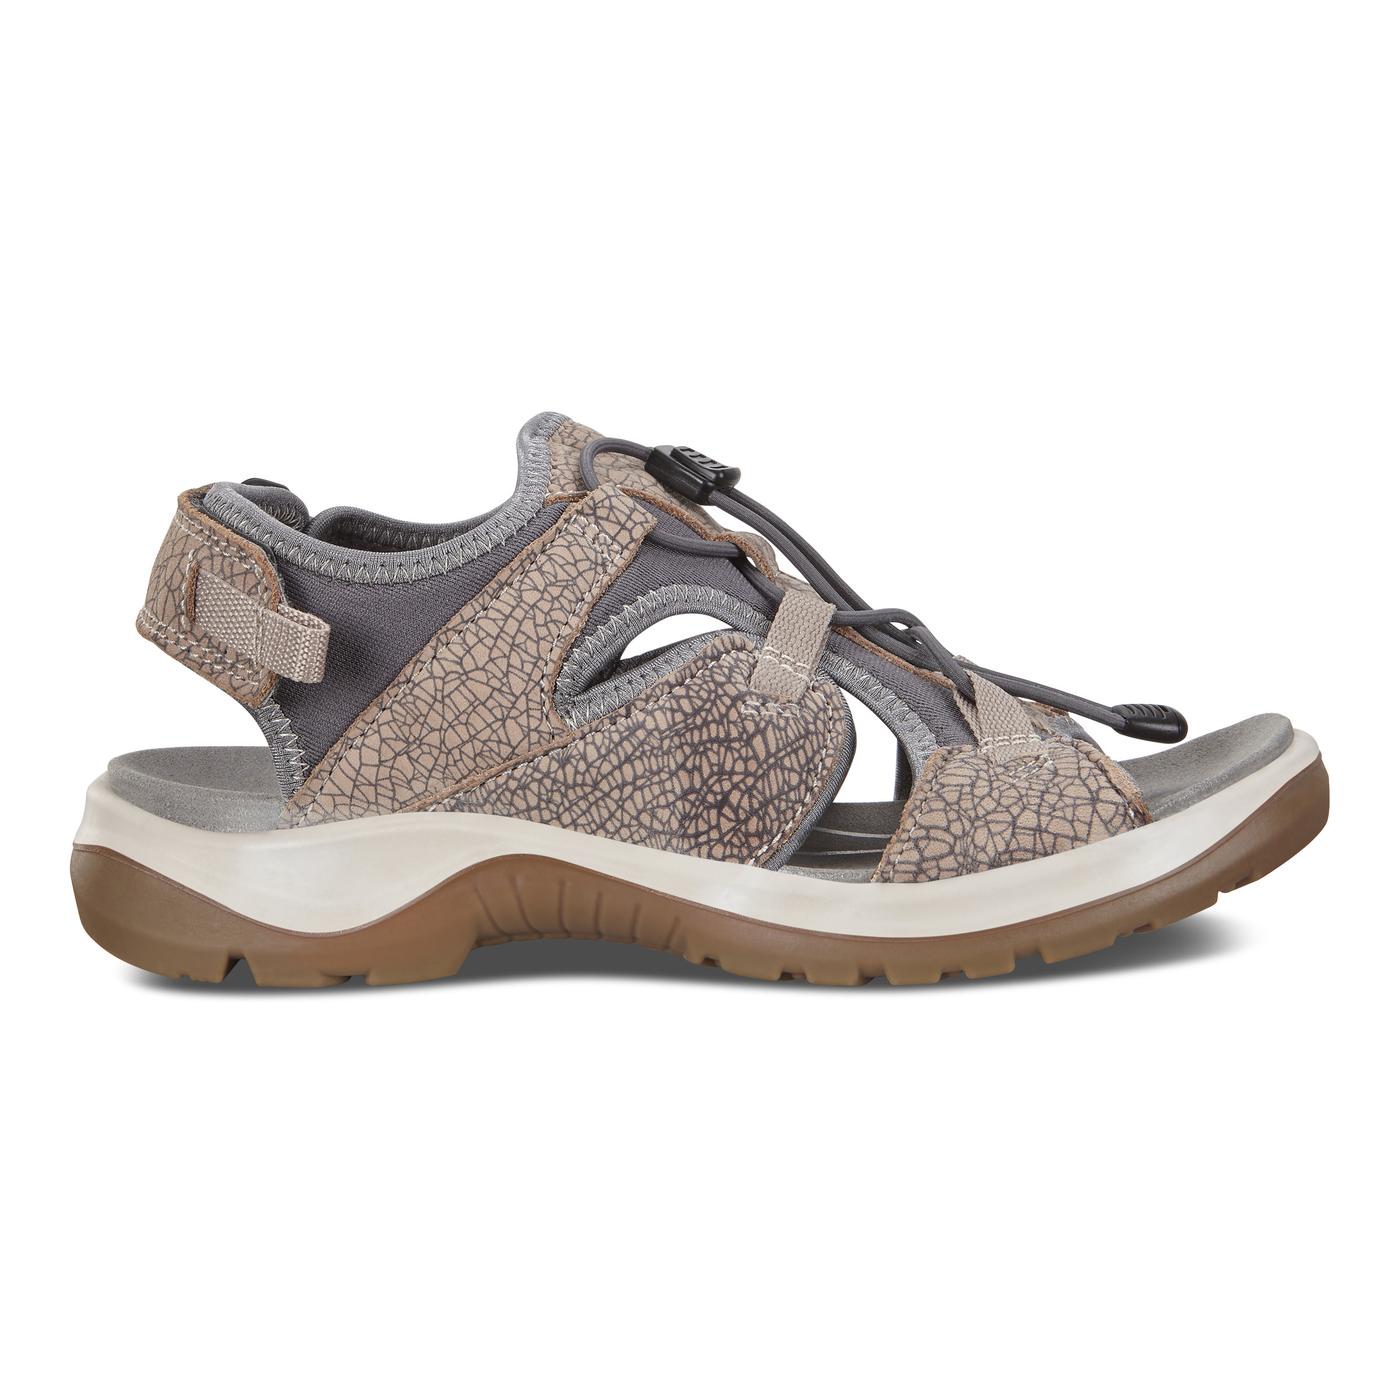 ECCO OFFROAD Outdoor Shoe